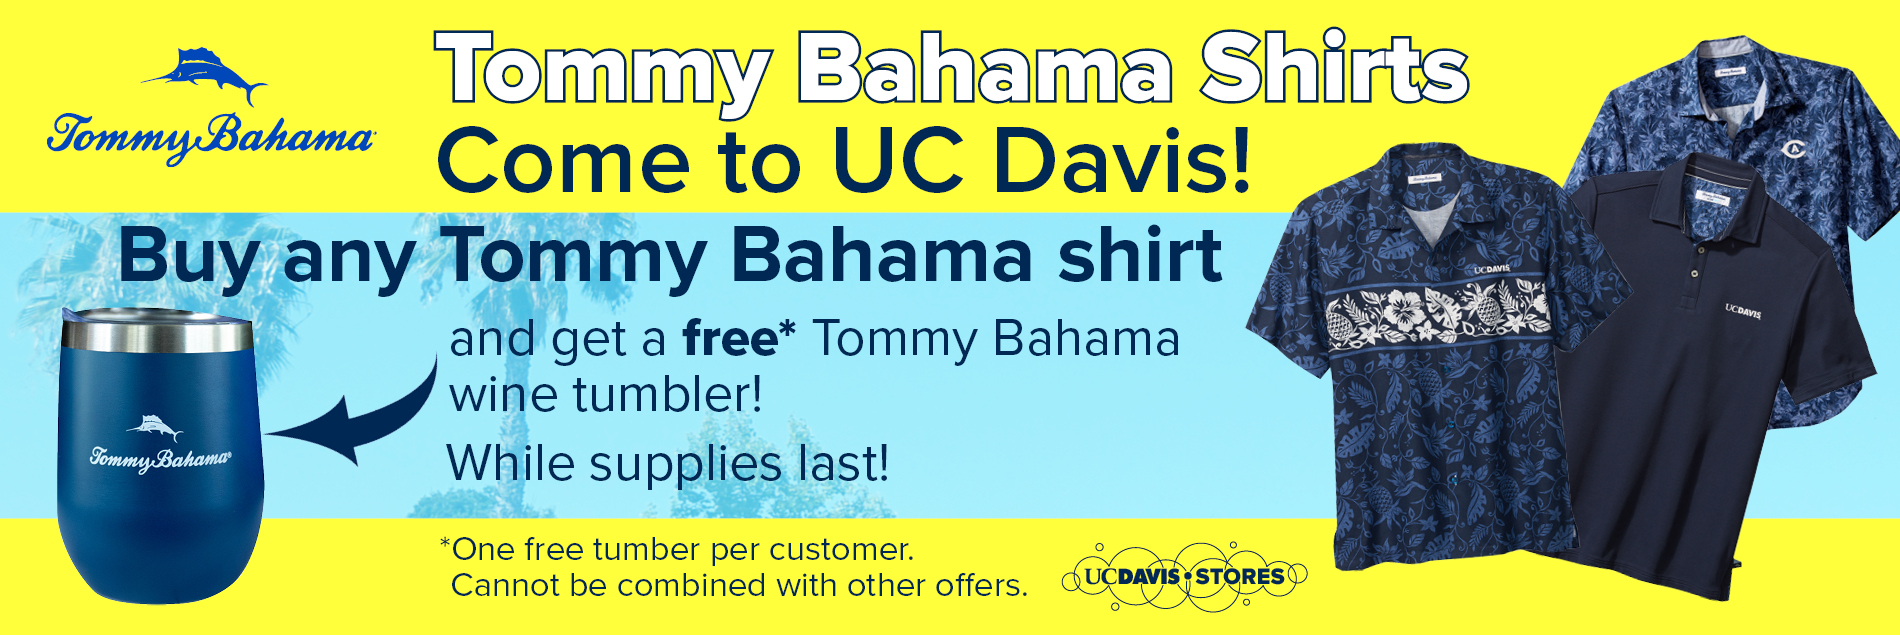 Tommy Bahama Shirt Sale Banner